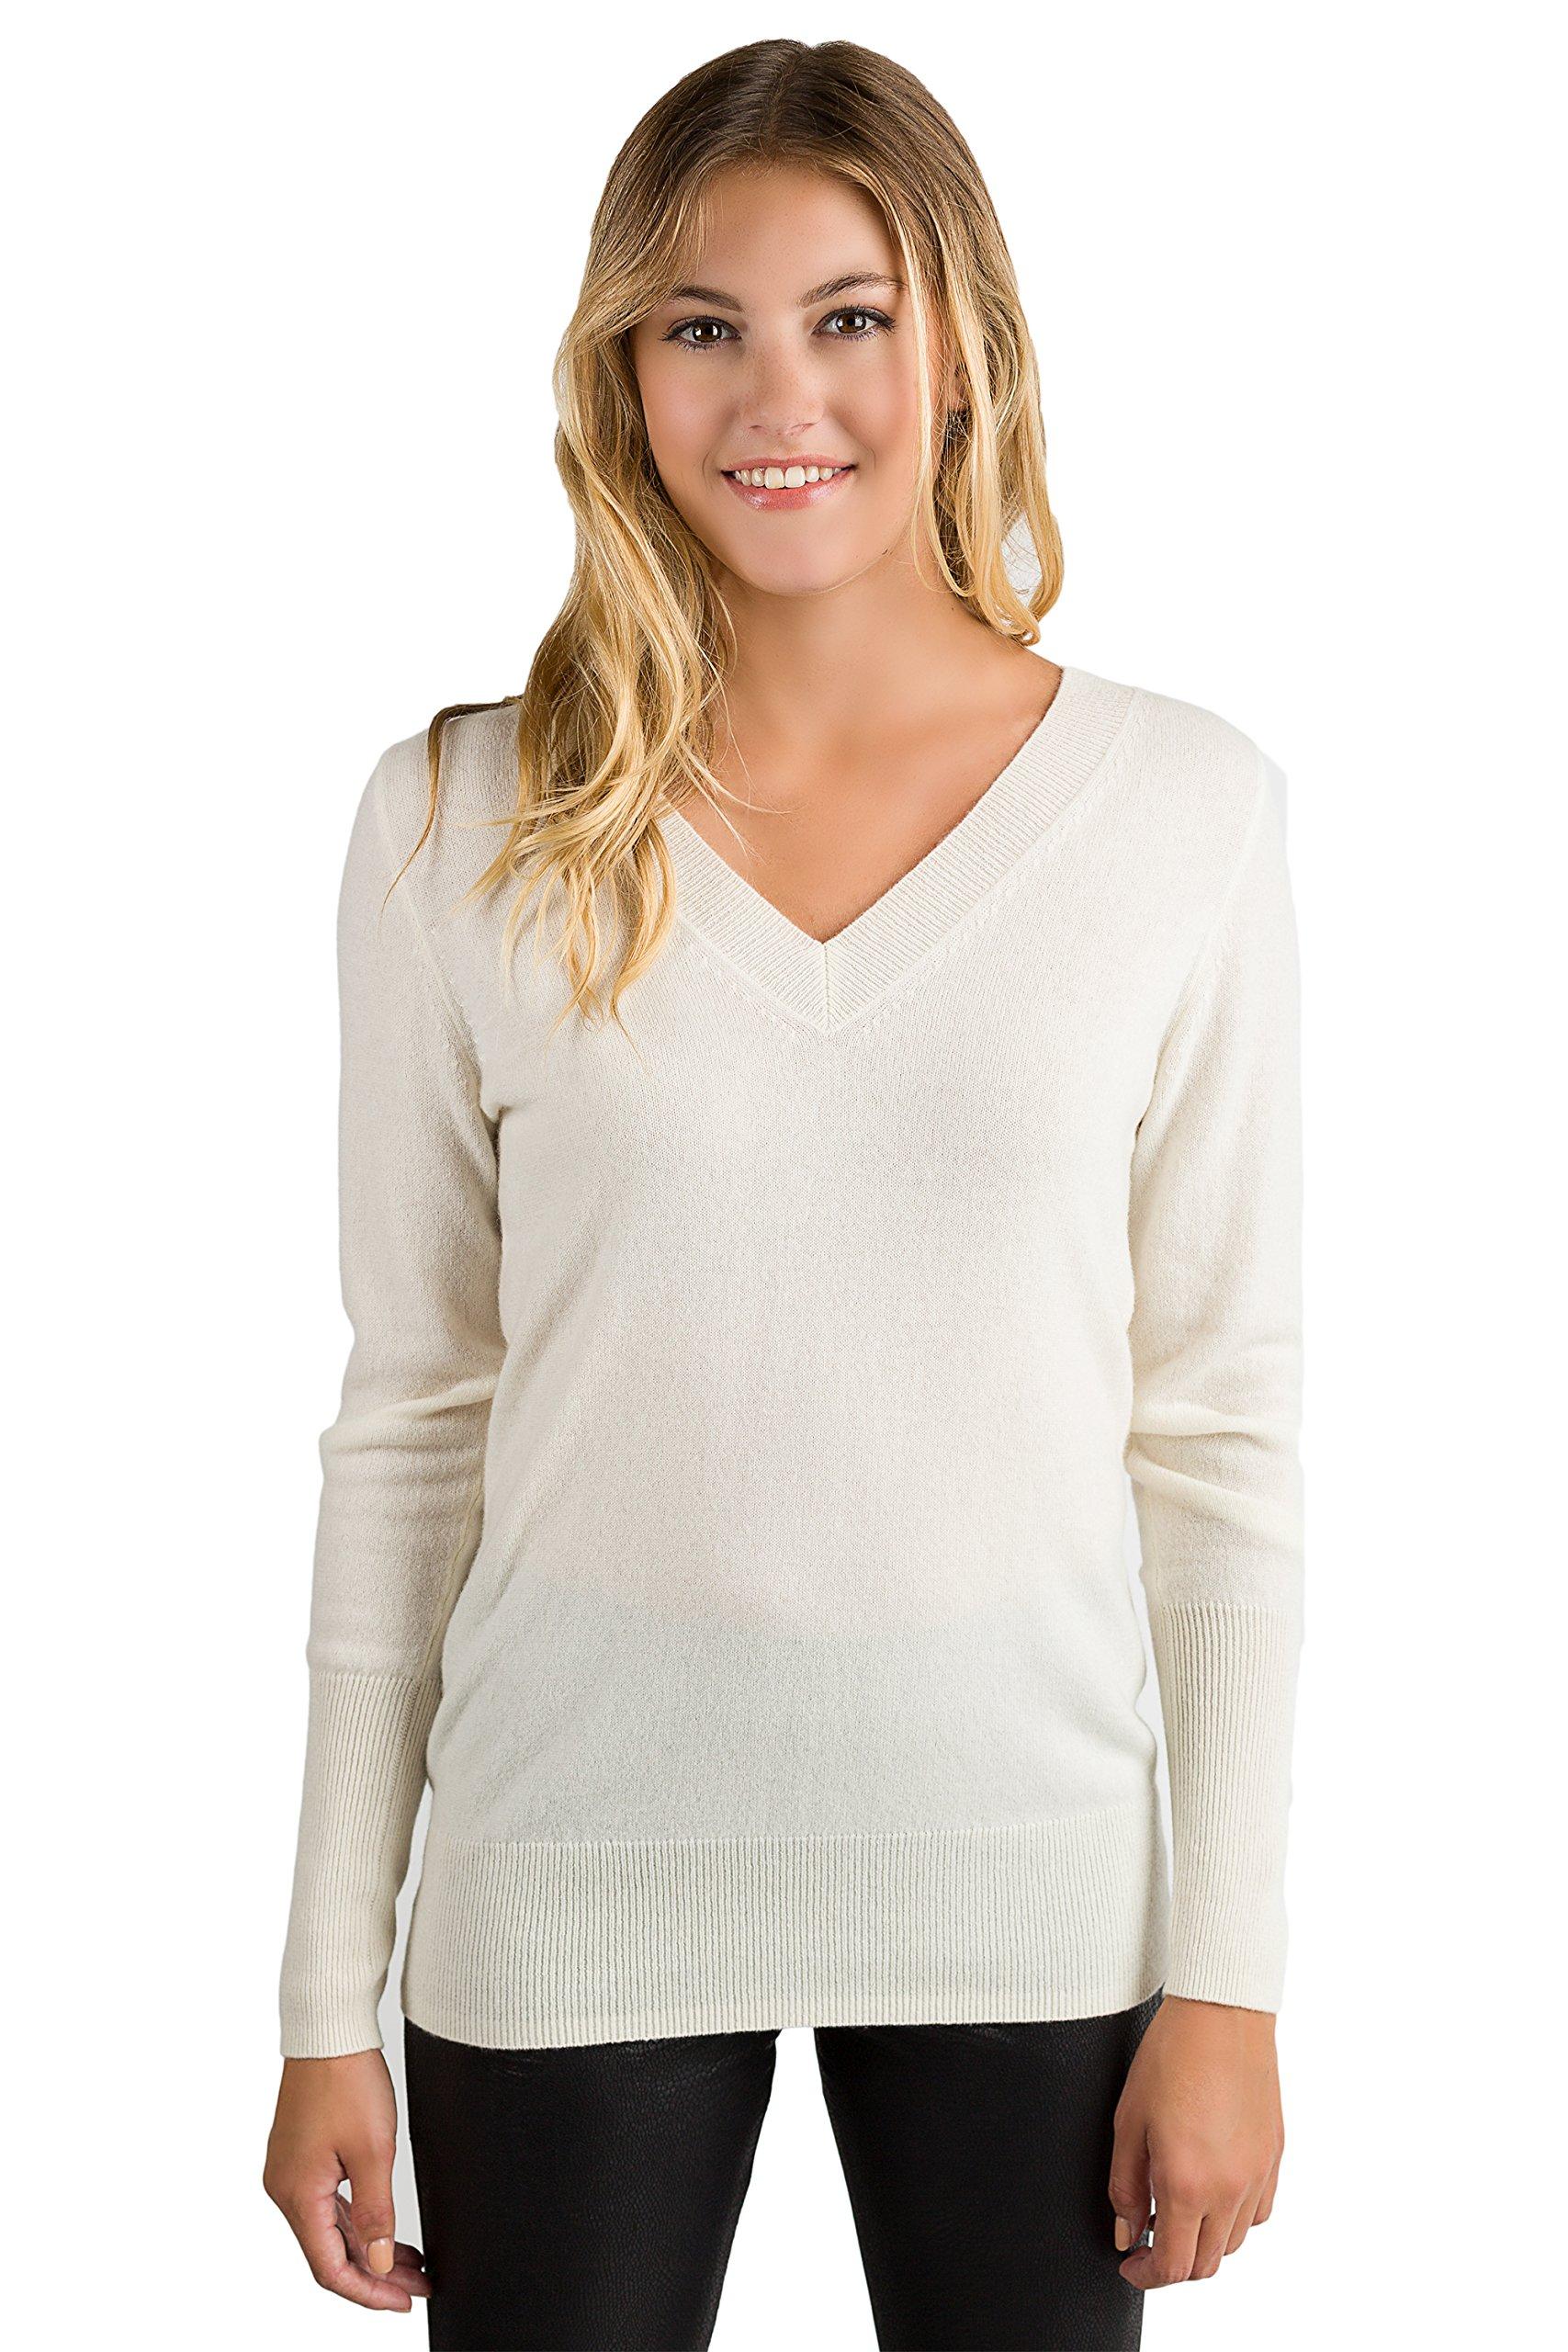 JENNIE LIU Women's 100% Pure Cashmere Long Sleeve Ava V Neck Pullover Sweater (PM, Cream) by JENNIE LIU (Image #1)